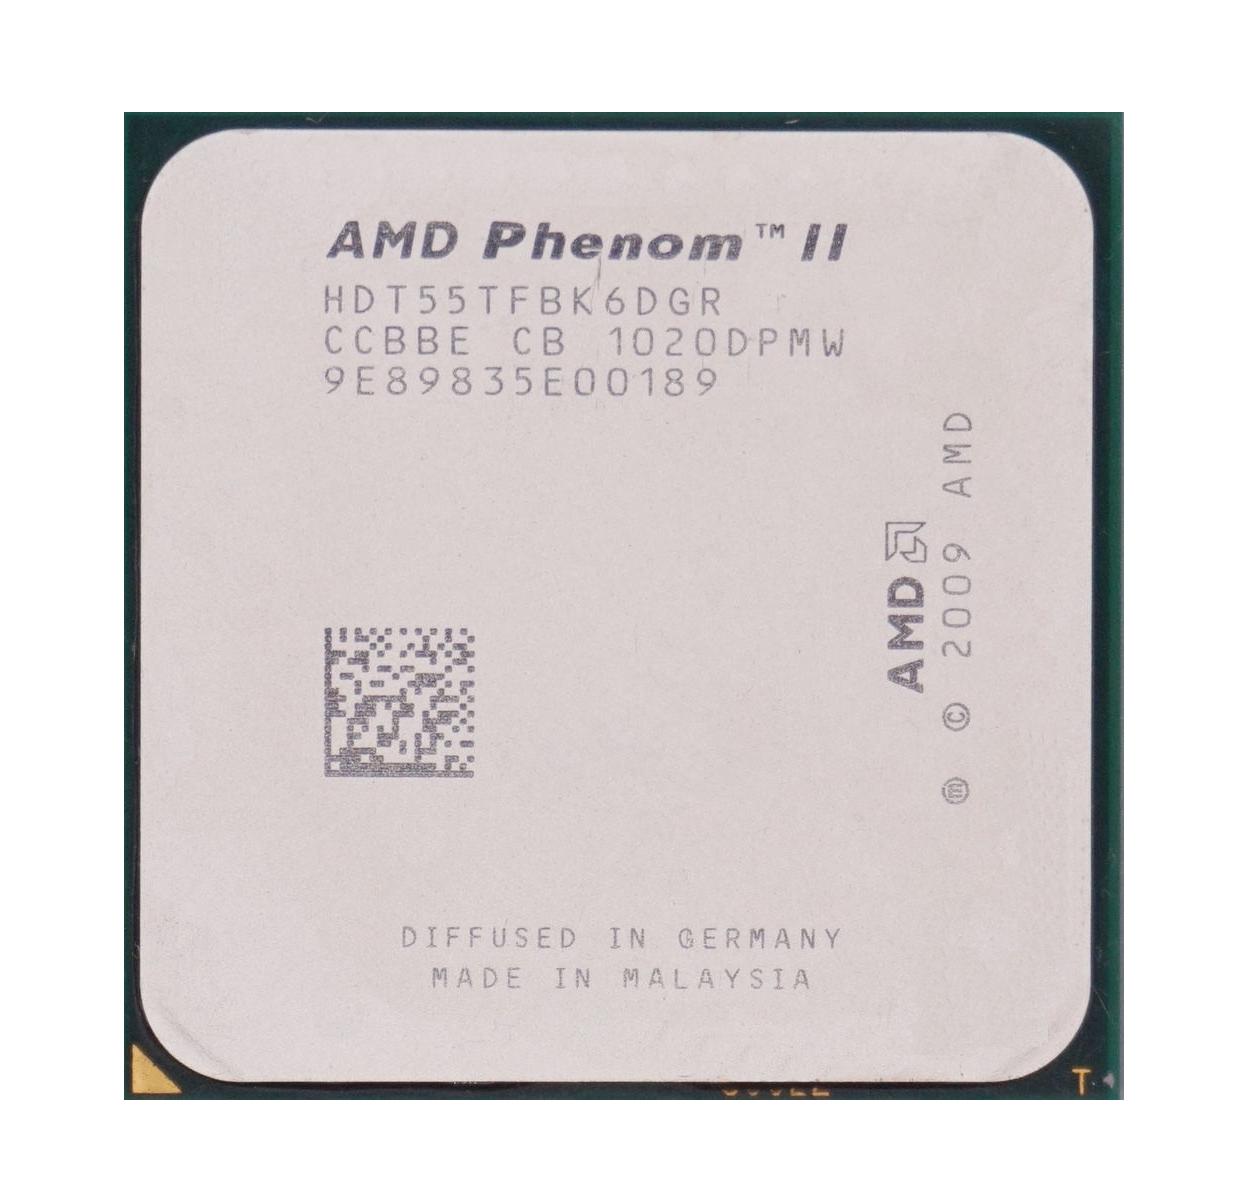 Процессор AMD Phenom II X6 Thuban 1055T, 2800MHz (HDT55TFBK6DGR) sAM3, tray